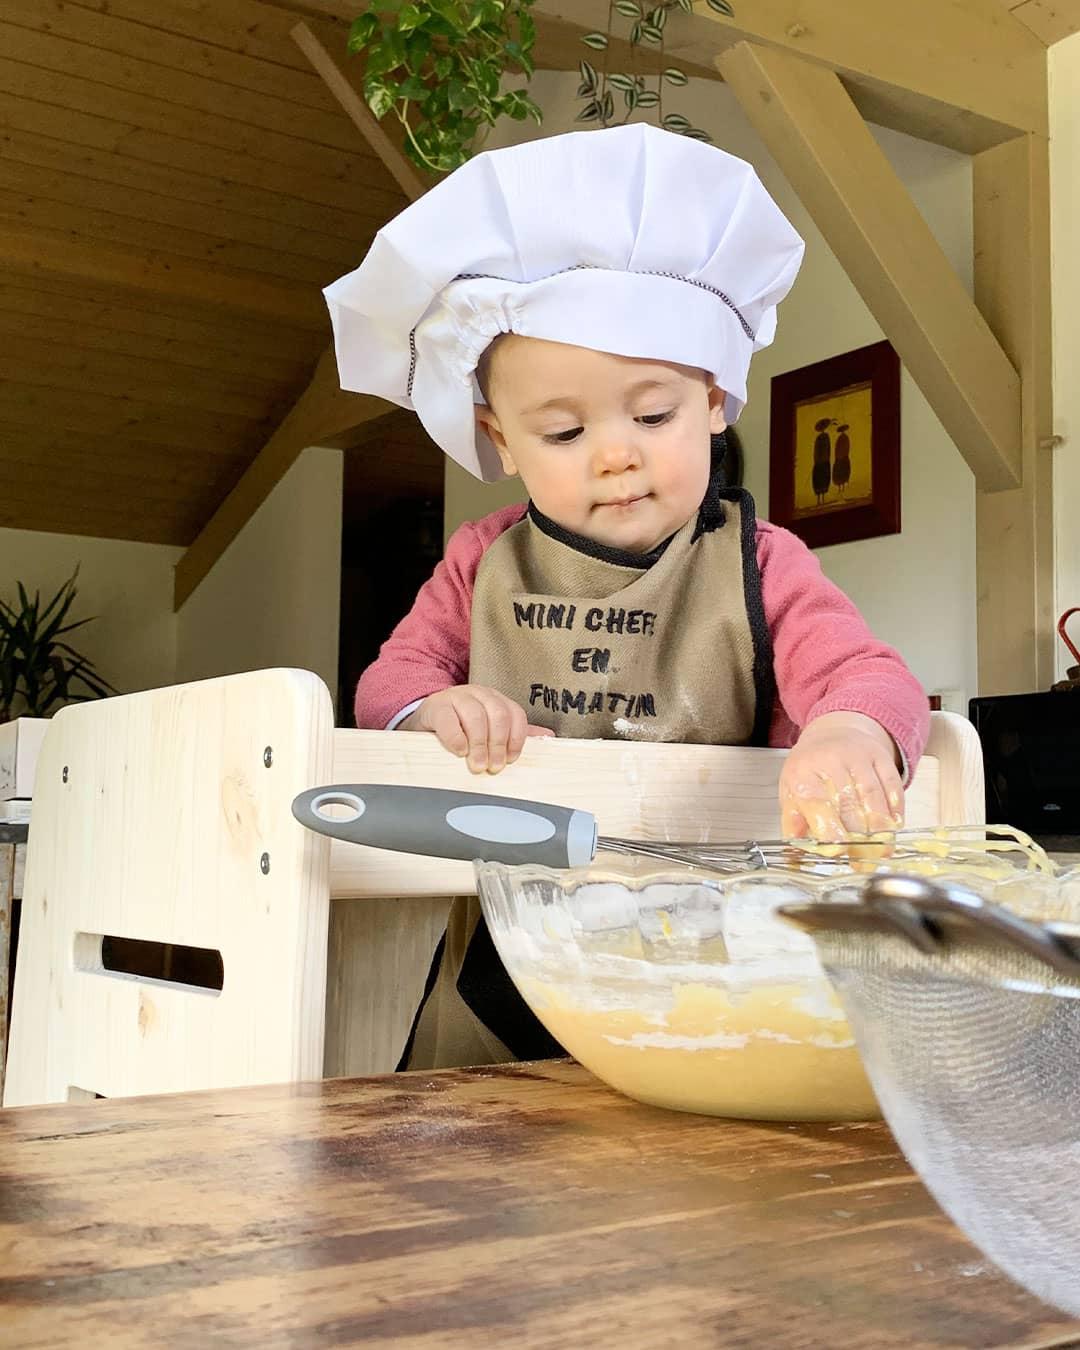 tour apprentissage mini chef cuisine